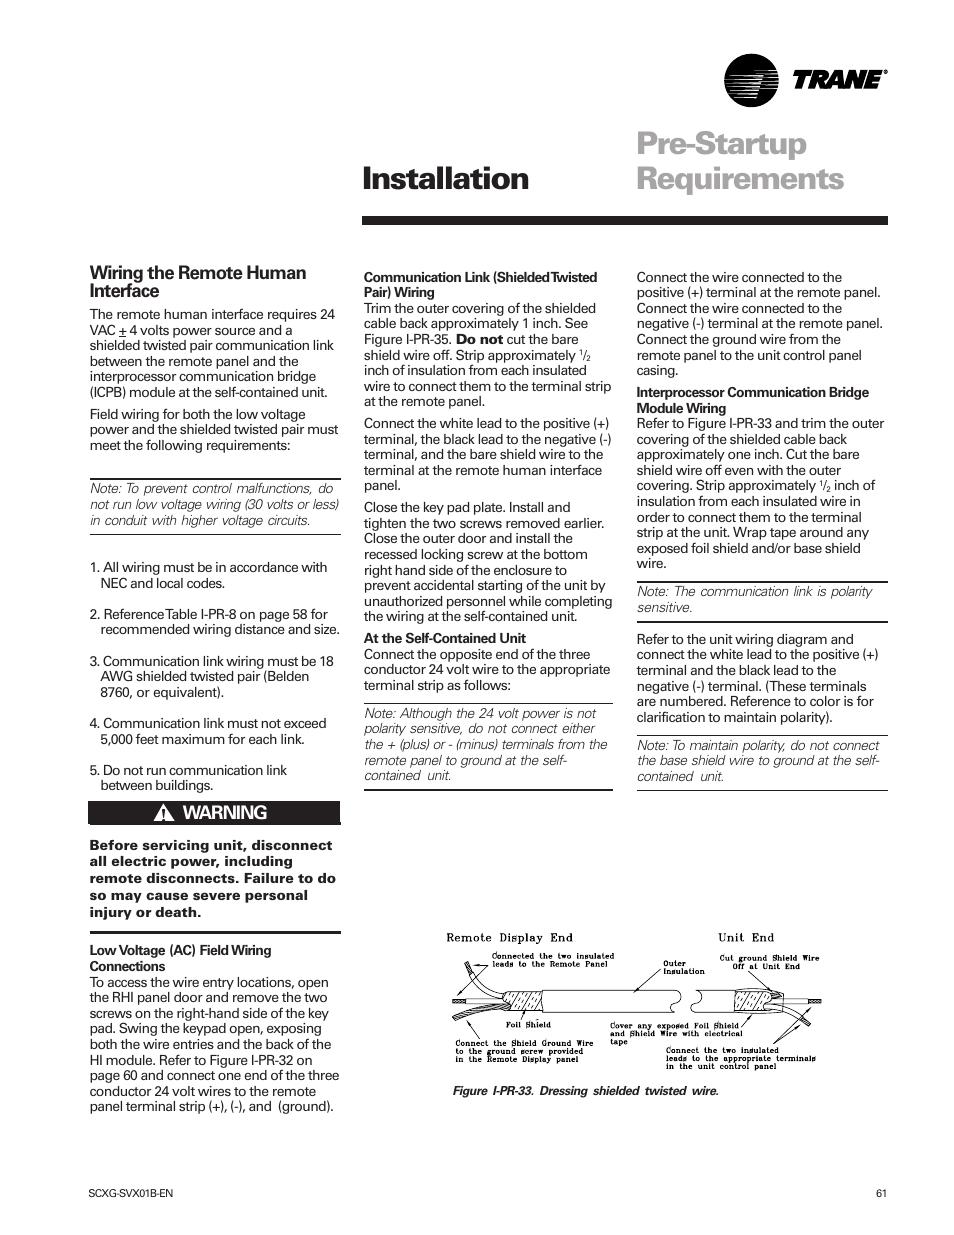 Pre-startup requirements installation | Trane IntelliPak SCWG 020 ...